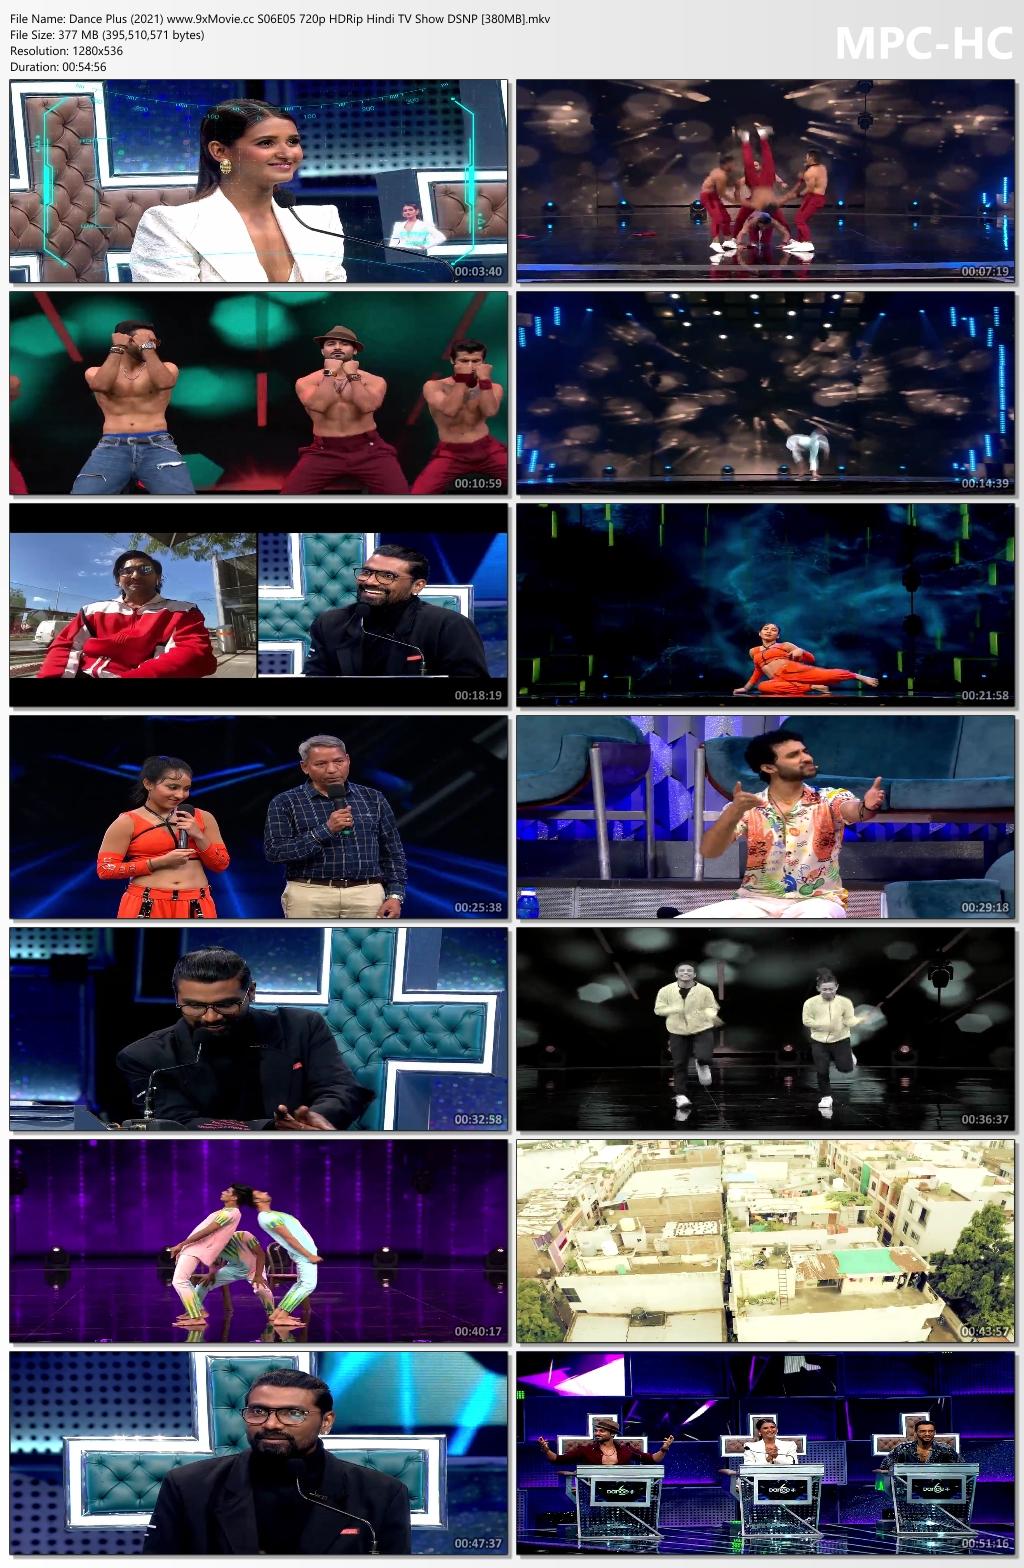 Dance-Plus-2021-www-9x-Movie-cc-S06-E05-720p-HDRip-Hindi-TV-Show-DSNP-380-MB-mkv